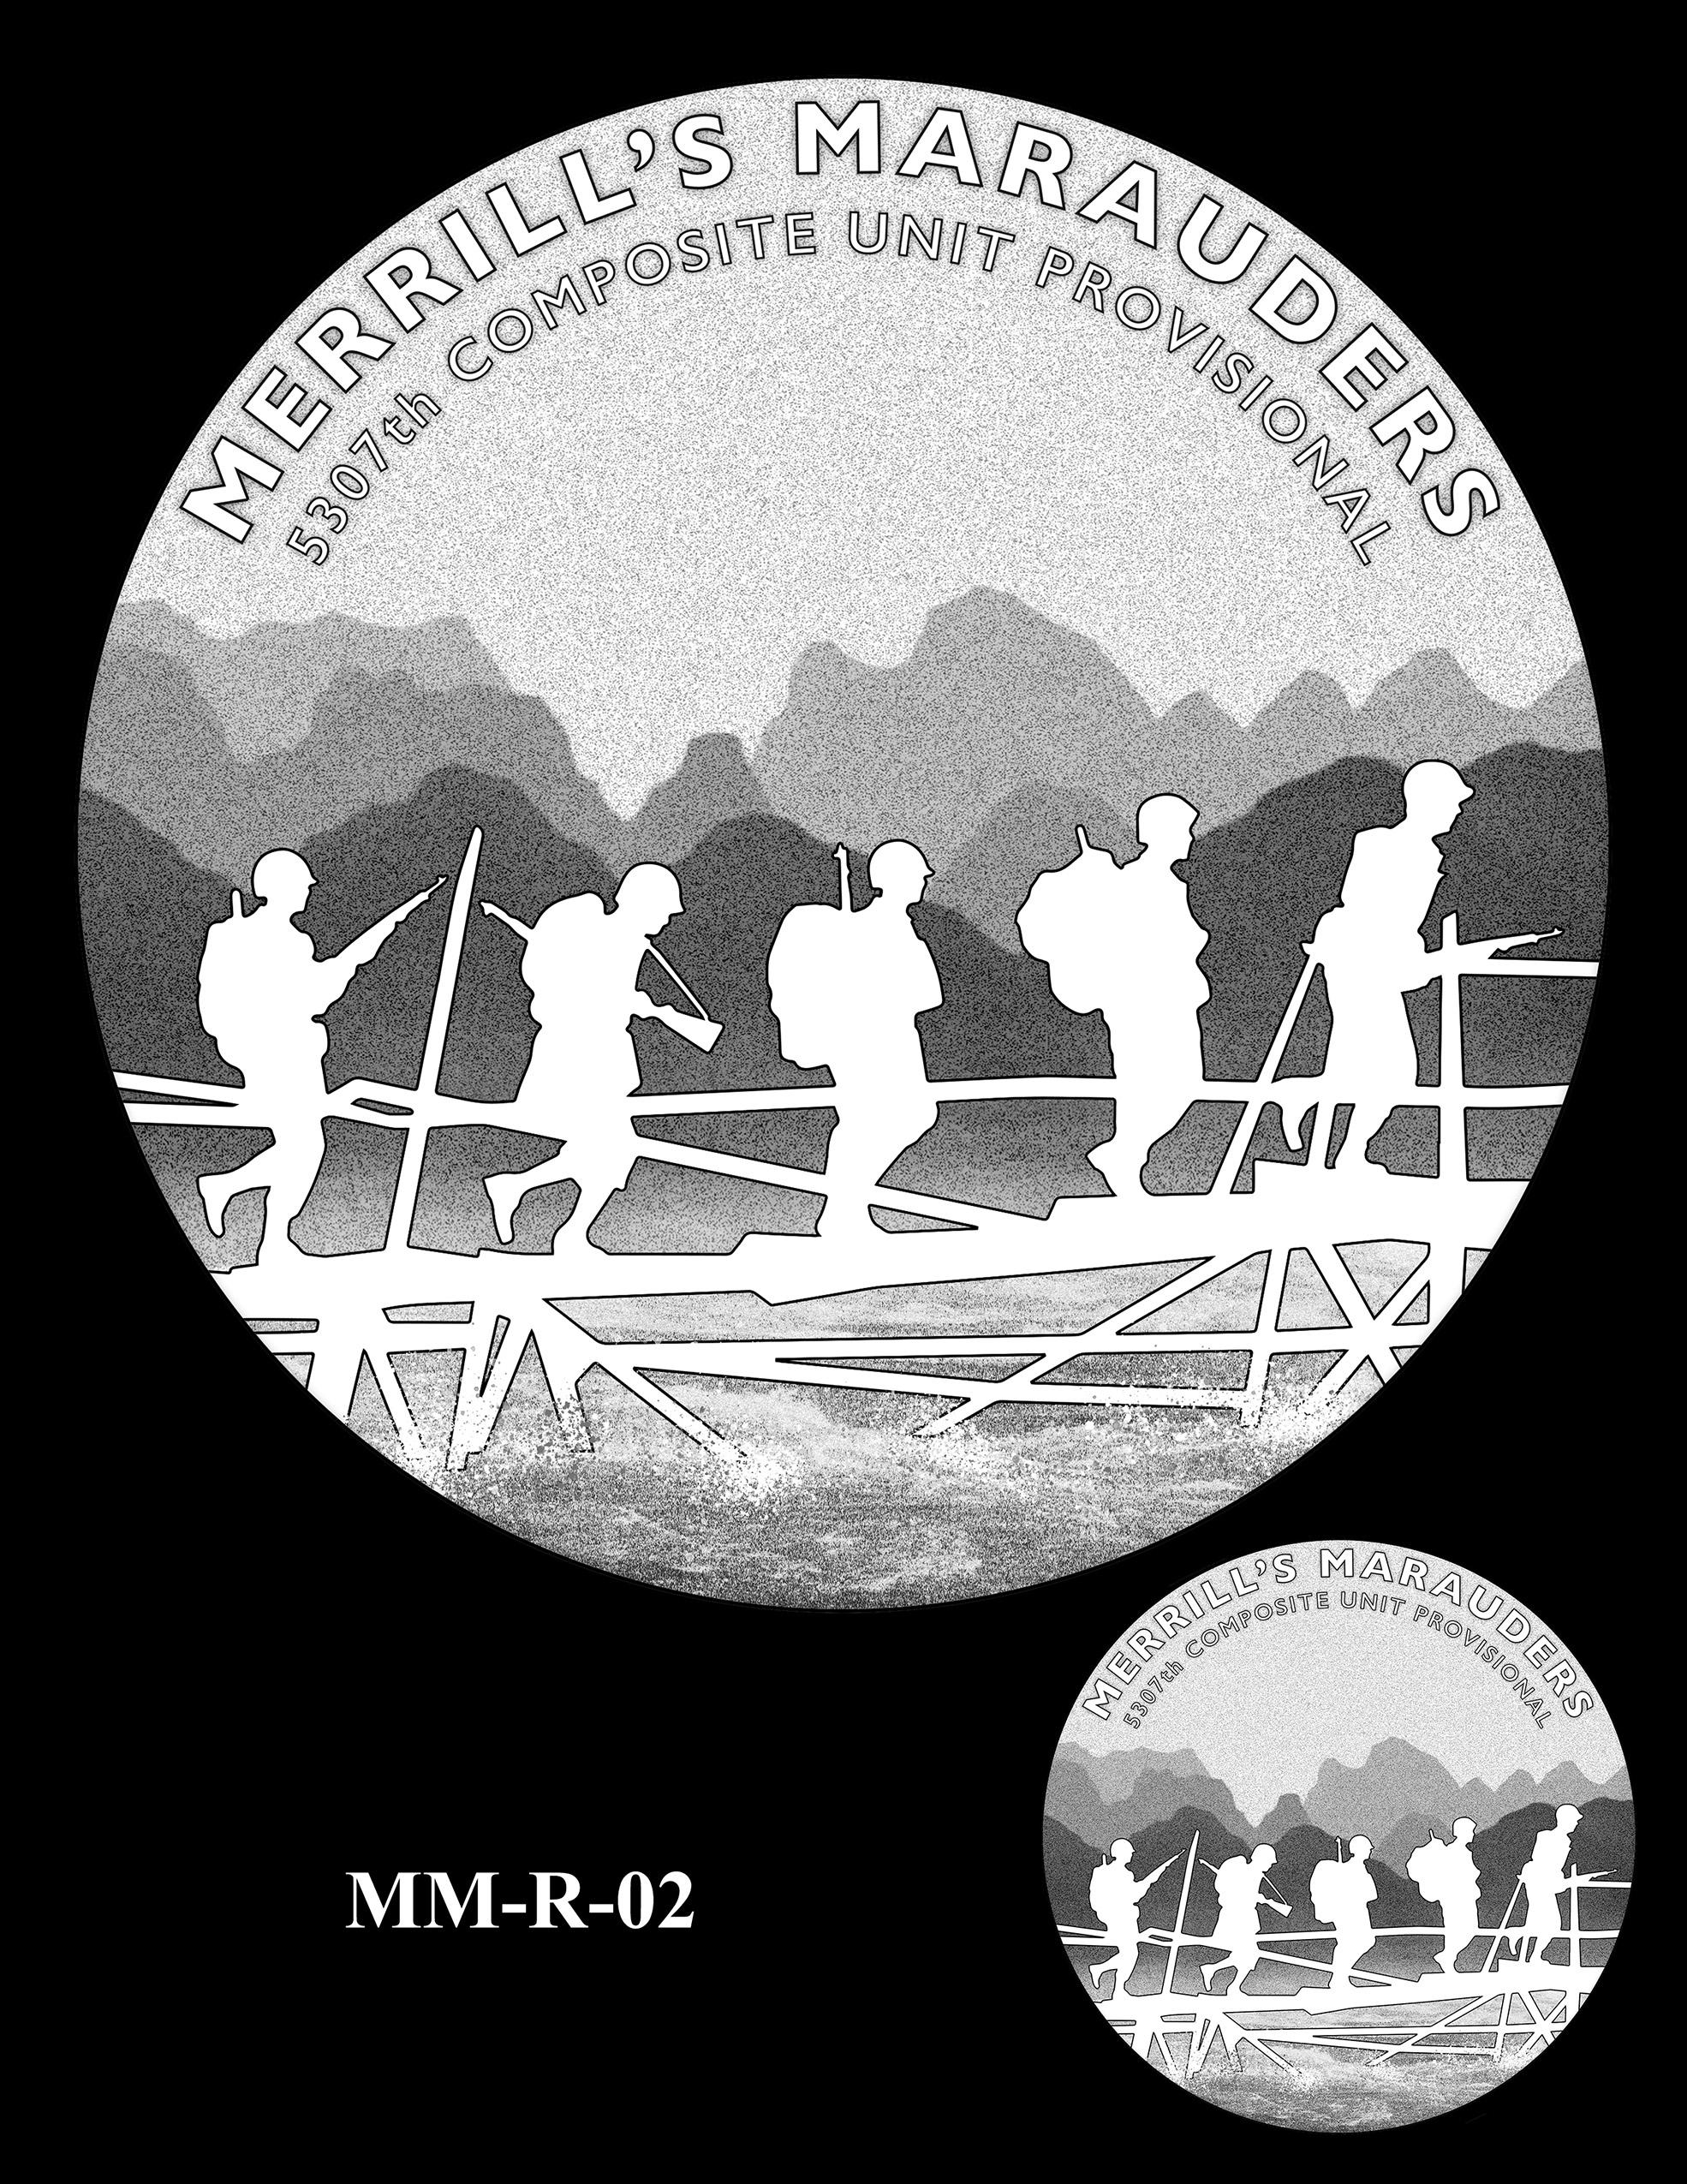 MM-R-02 -- Merrill's Marauders Congressional Gold Medal